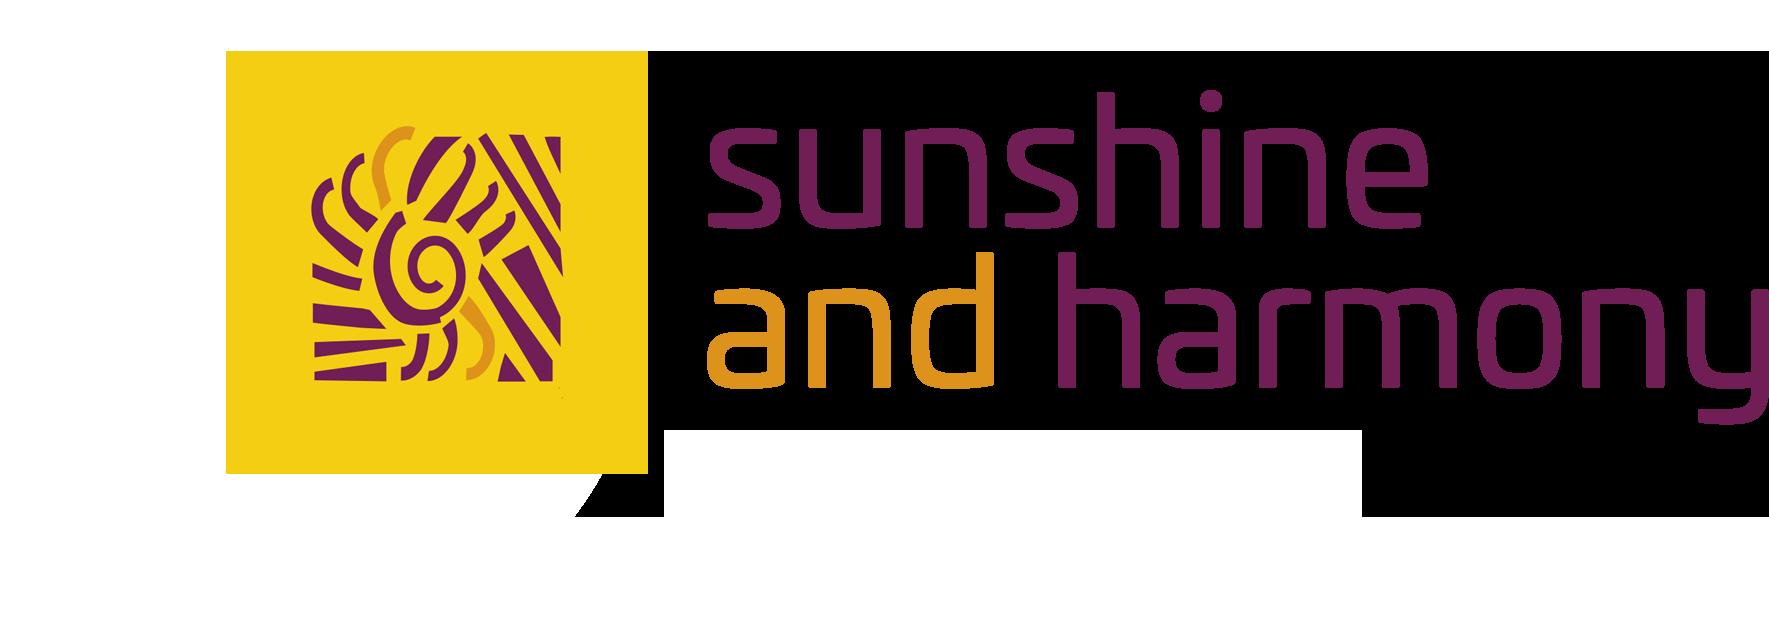 INKtoPIX logo Sunshine and Harmony